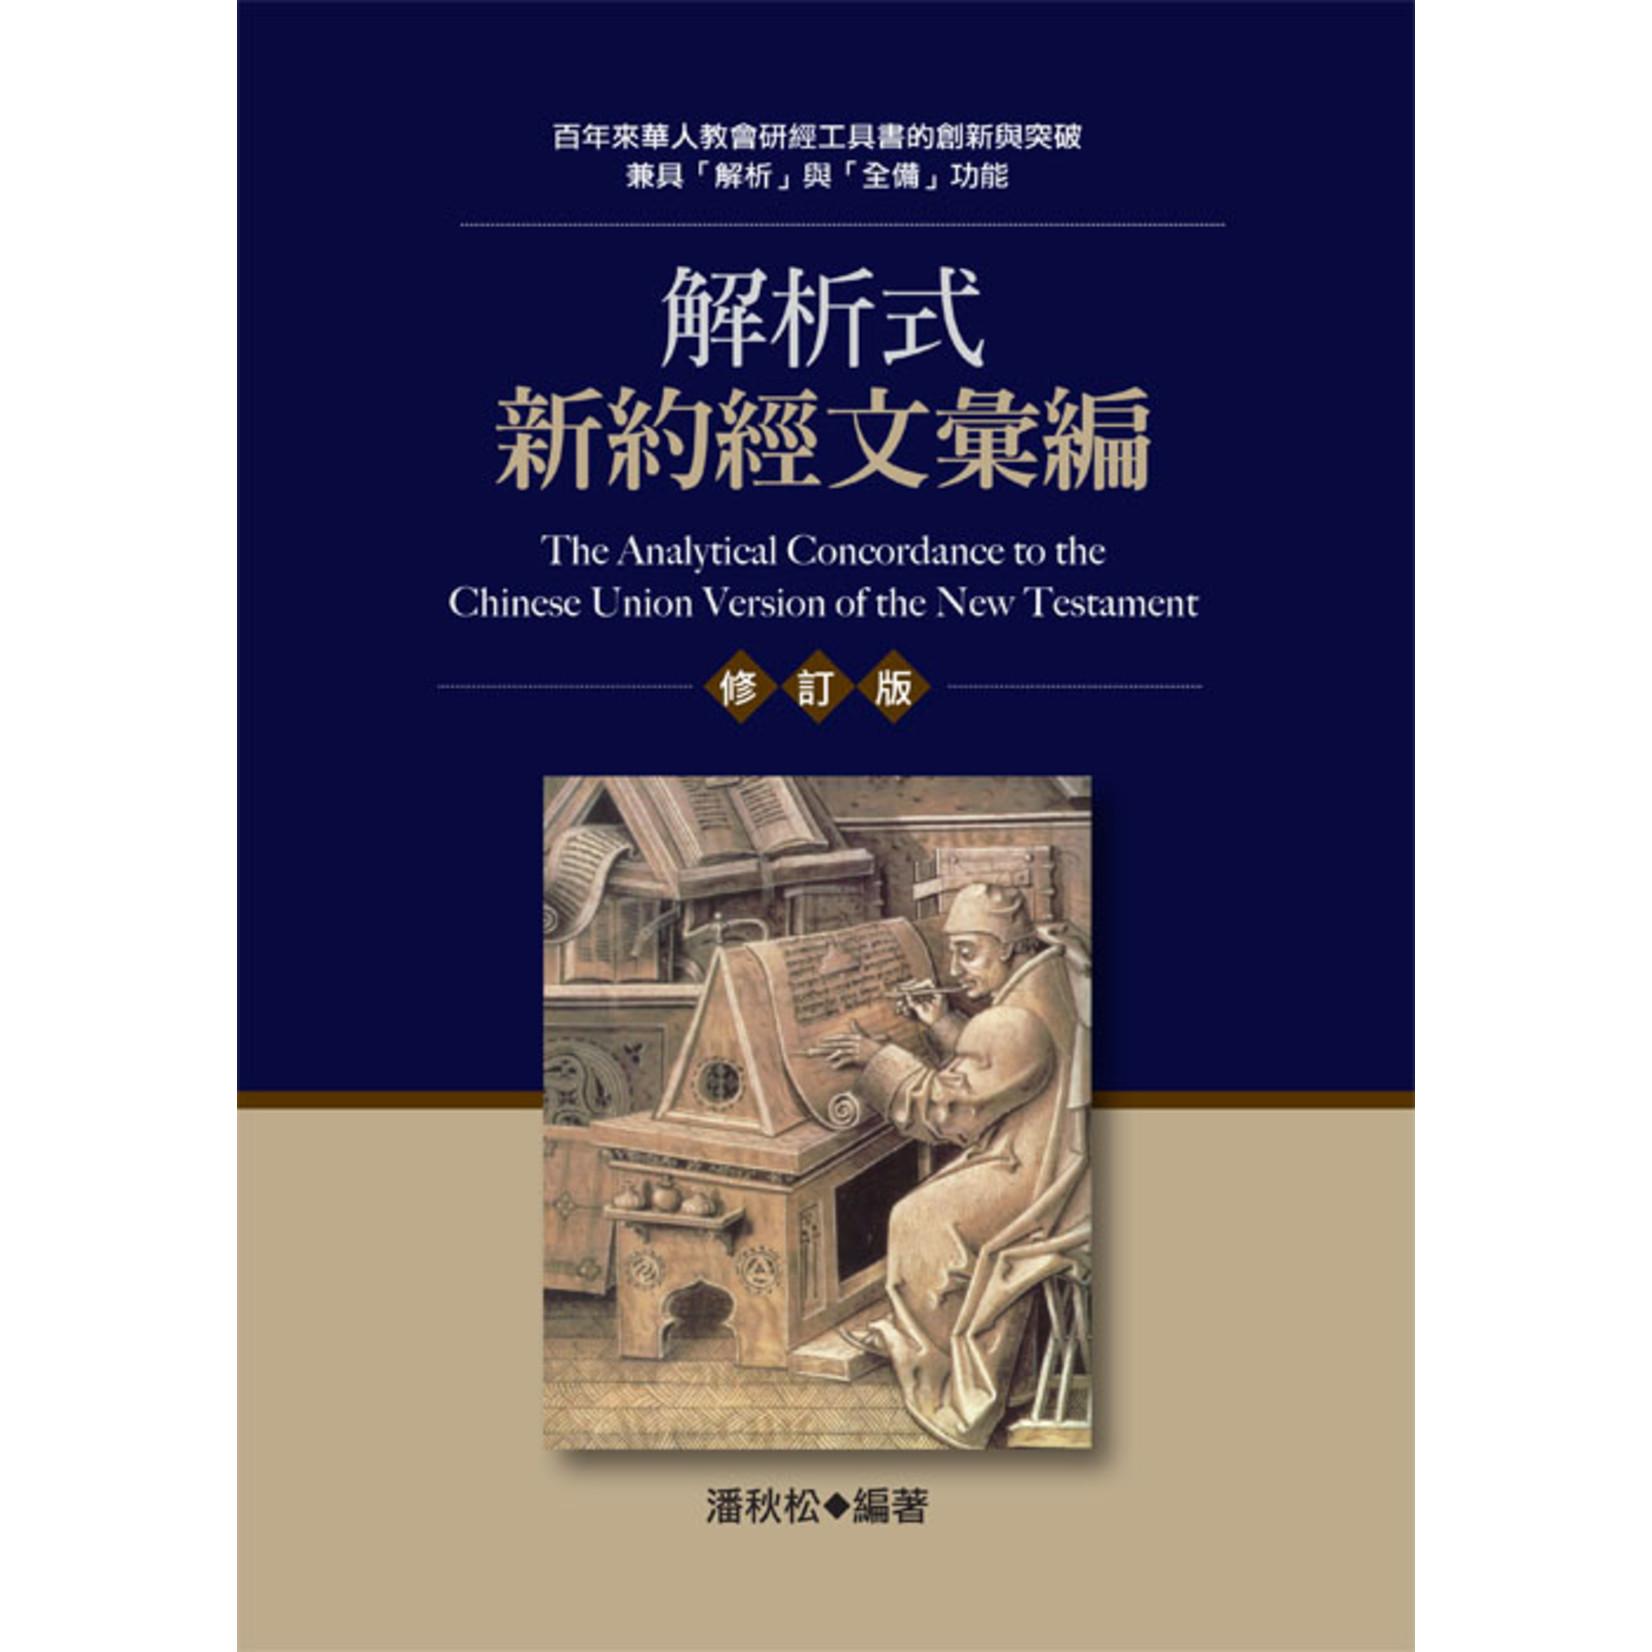 美國麥種傳道會 AKOWCM 解析式新約經文彙編(修訂版) The Analytical Concordance to the Chinese Union Version of the New Testament